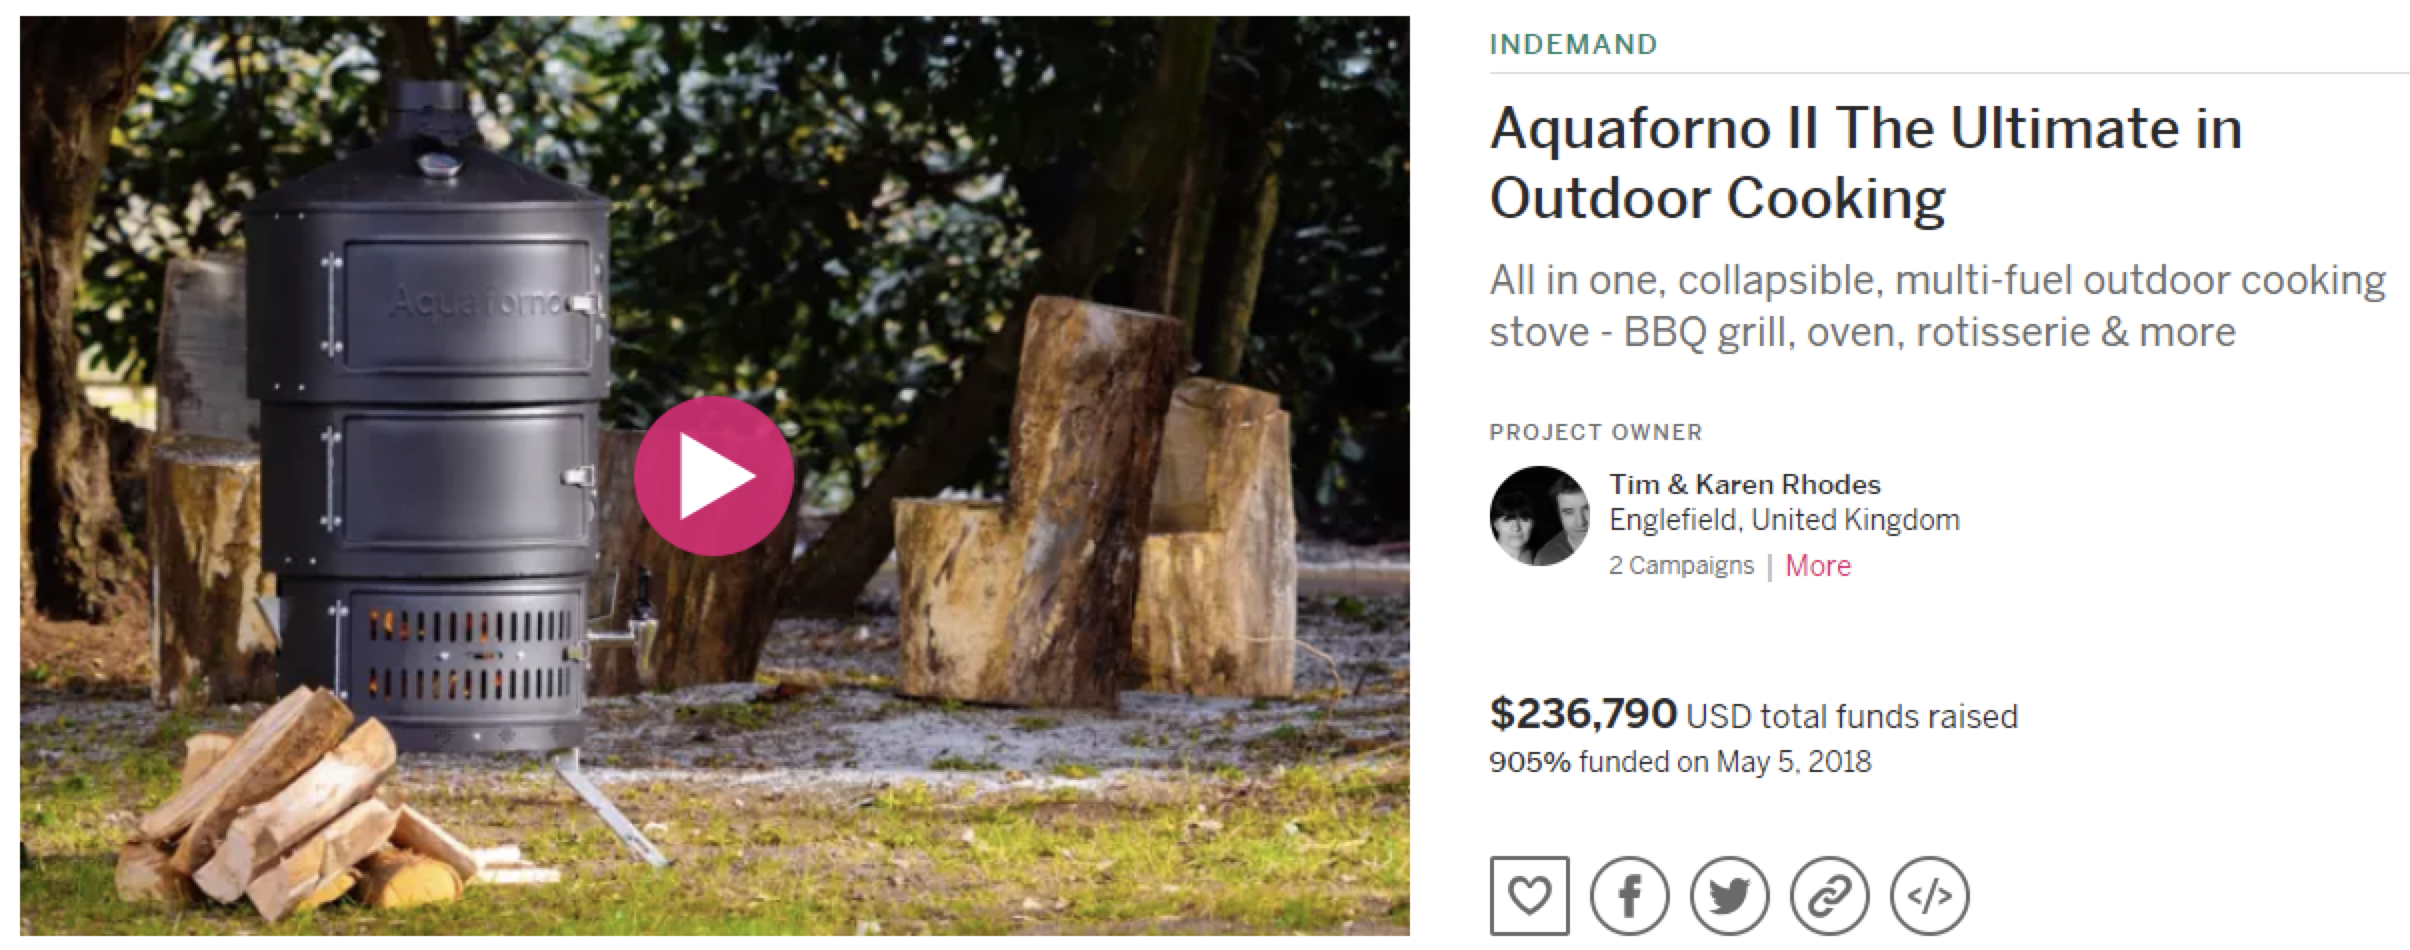 Aquaforno II campaign on Indiegogo